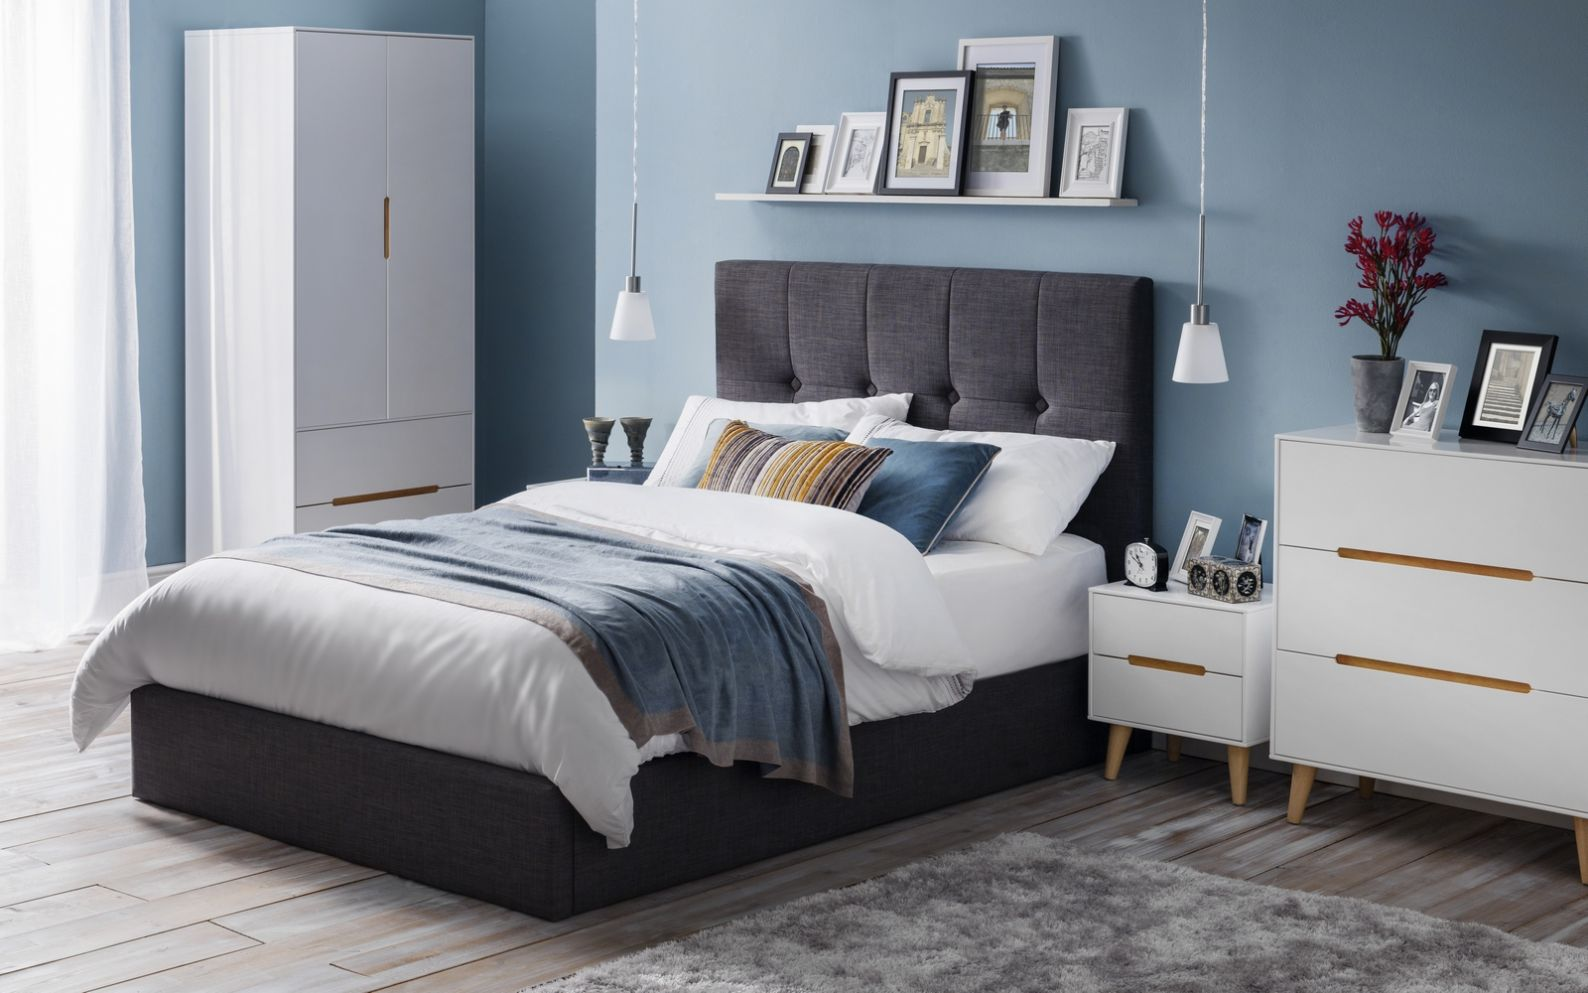 Sorrento Lift-up Storage Bed - Slate